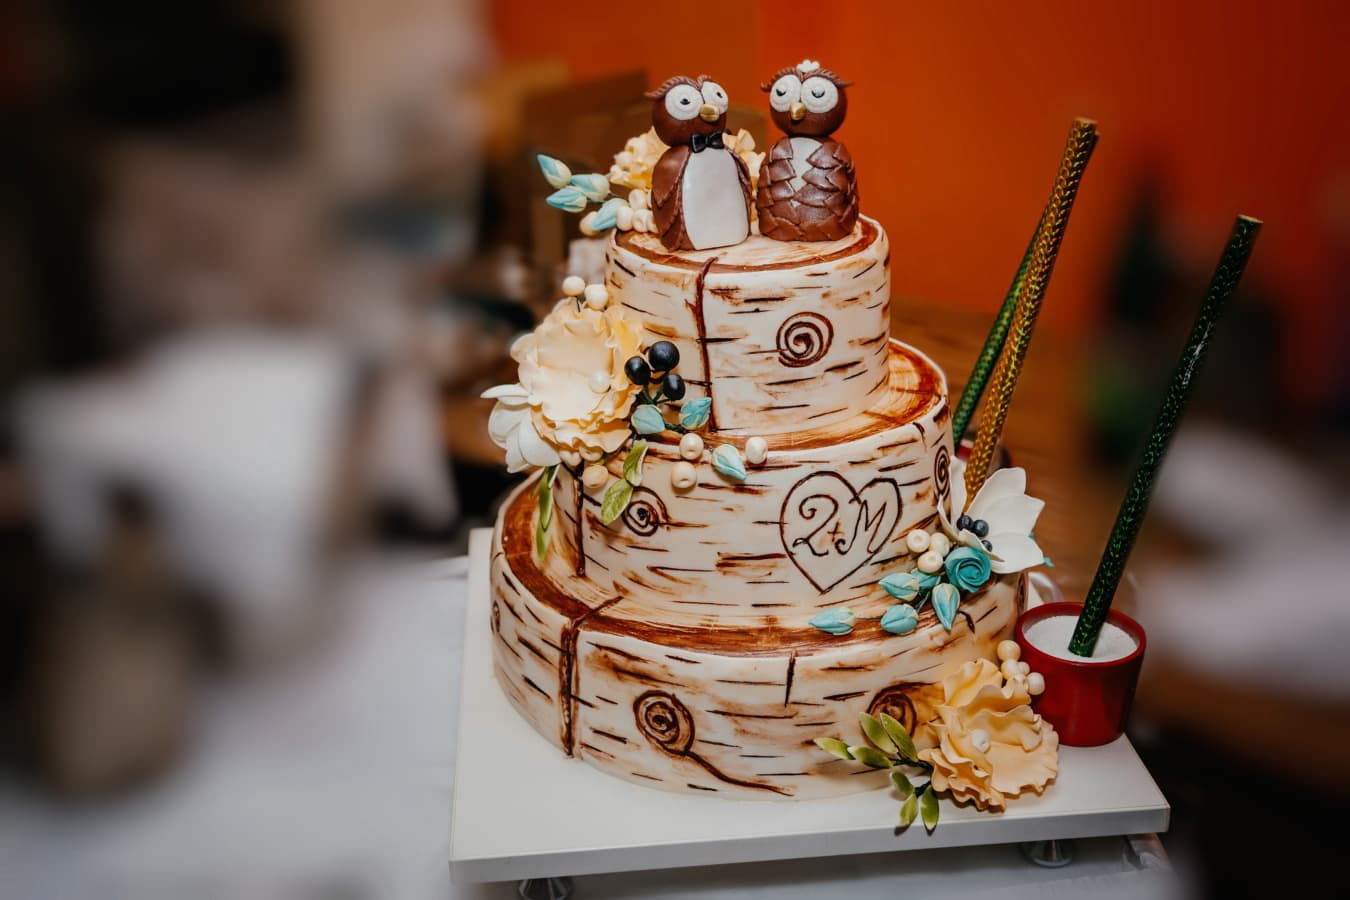 party, cake, penguin, miniature, decoration, chocolate, cream, food, sugar, sweet